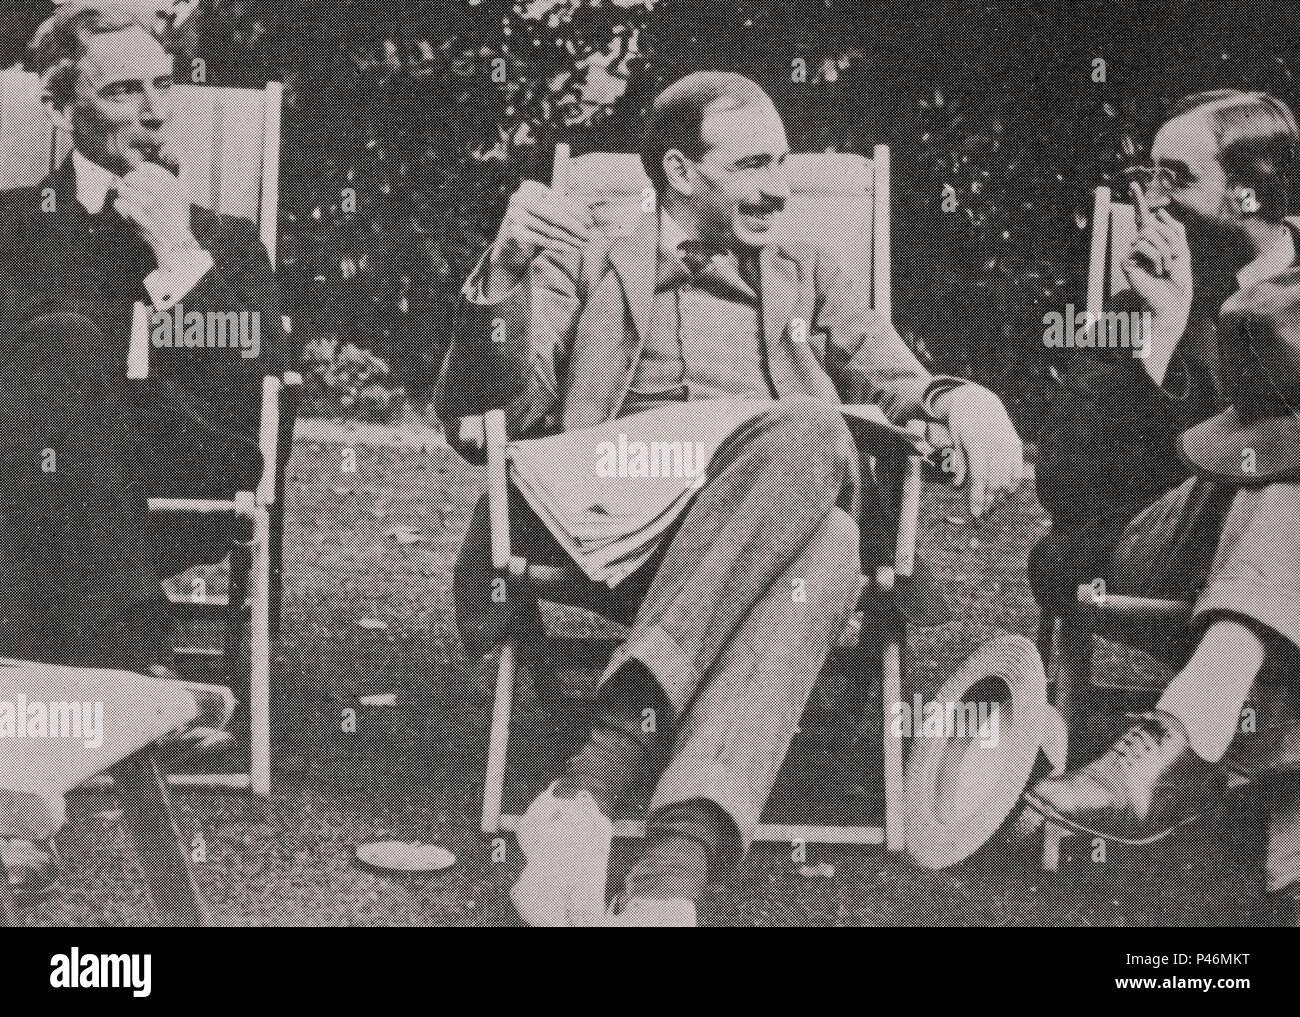 Bertrand Russell (1872-1970), mathématicien anglais, John Maynard Keynes (1883-1946), économiste anglais et Giles Lytton Strachey (1880-1932), écrivain anglais.. 1915. Banque D'Images